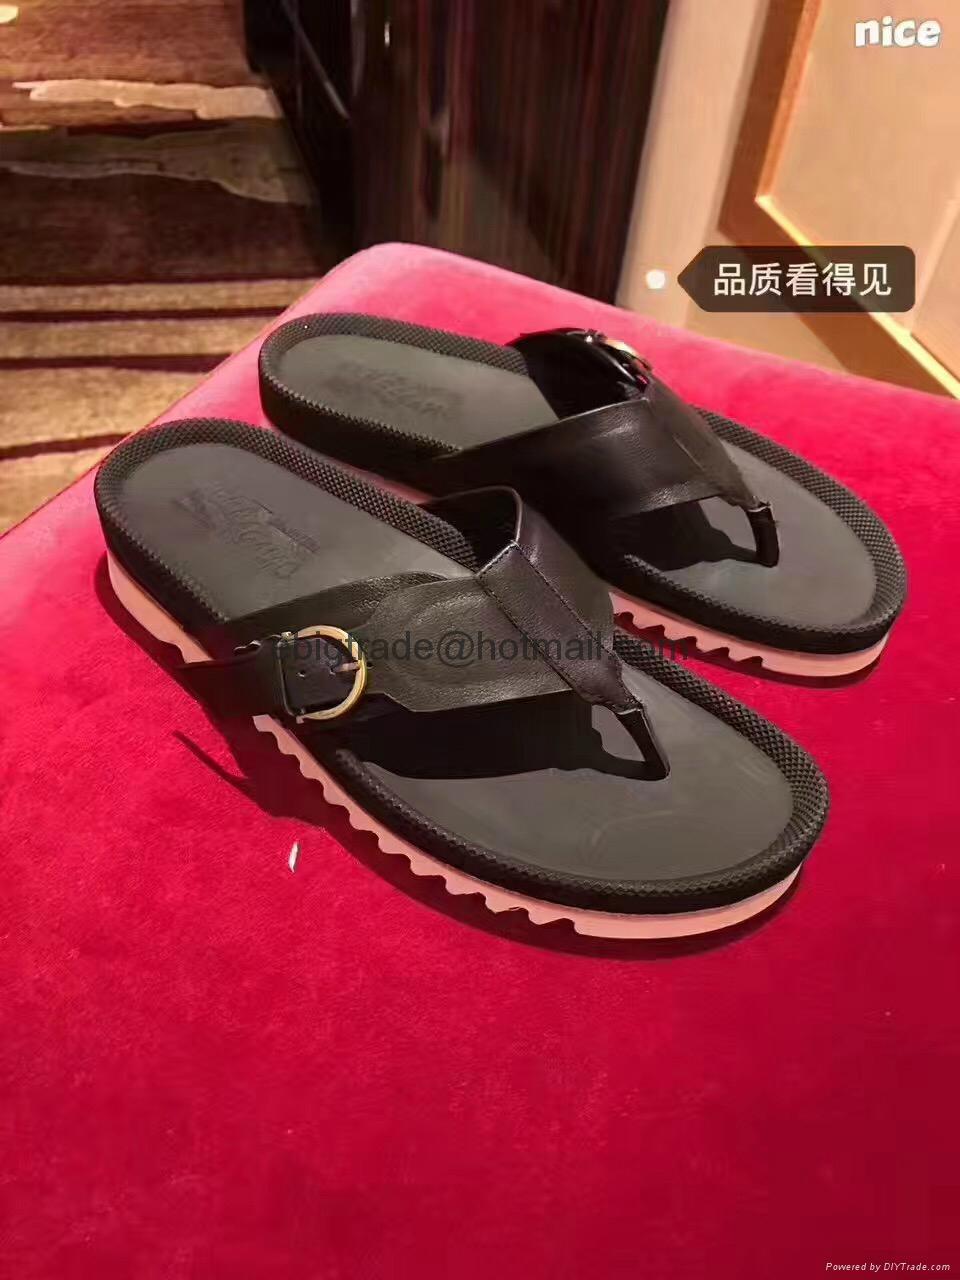 4ba4980569ae Cheap Salvatore Ferragamo Sandals Ferragamo men sandals Ferragamo